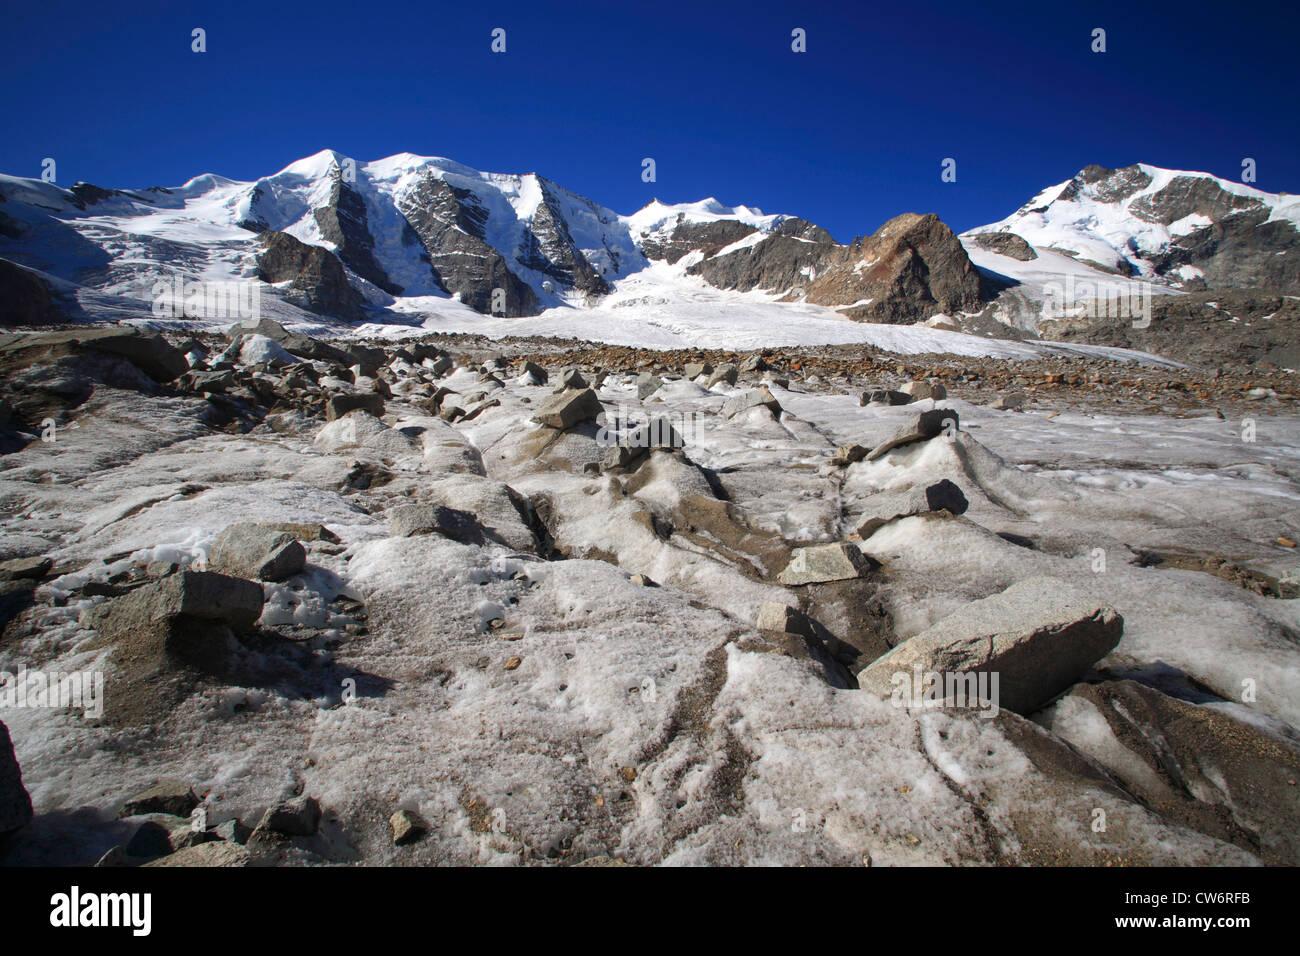 view from the Pers Glacier (Vadret Pers) on Piz Palue, Bellavista and Piz Bernina, Switzerland, Graubuenden, Engadine, Stock Photo